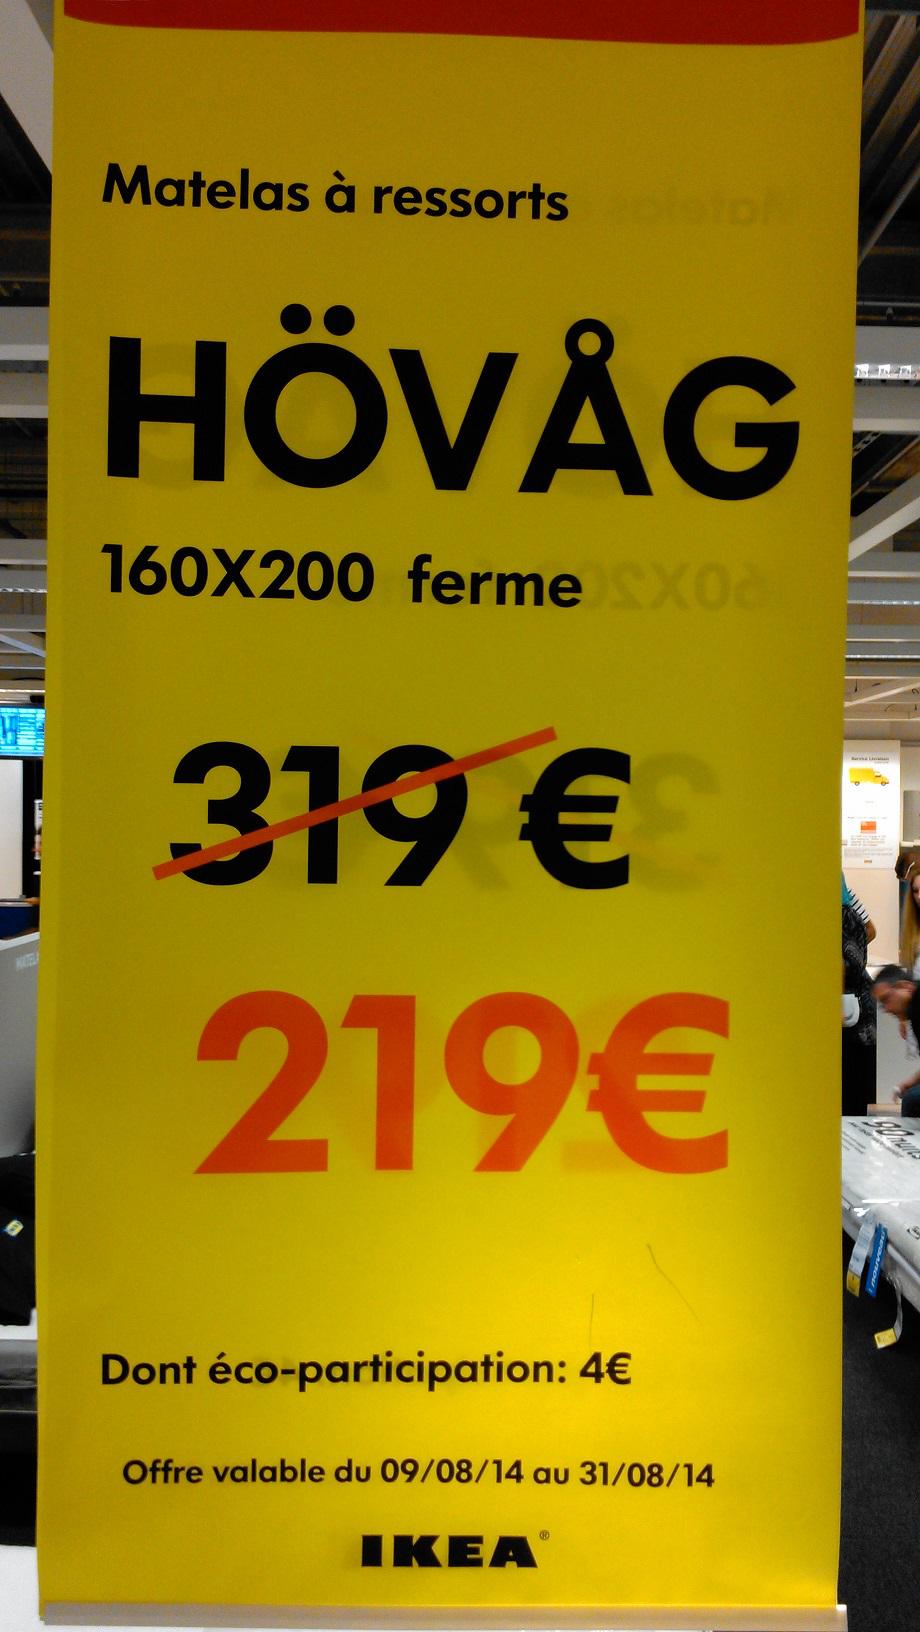 Matelas Ikea Hövâg à ressorts ensachés 160x200 ferme